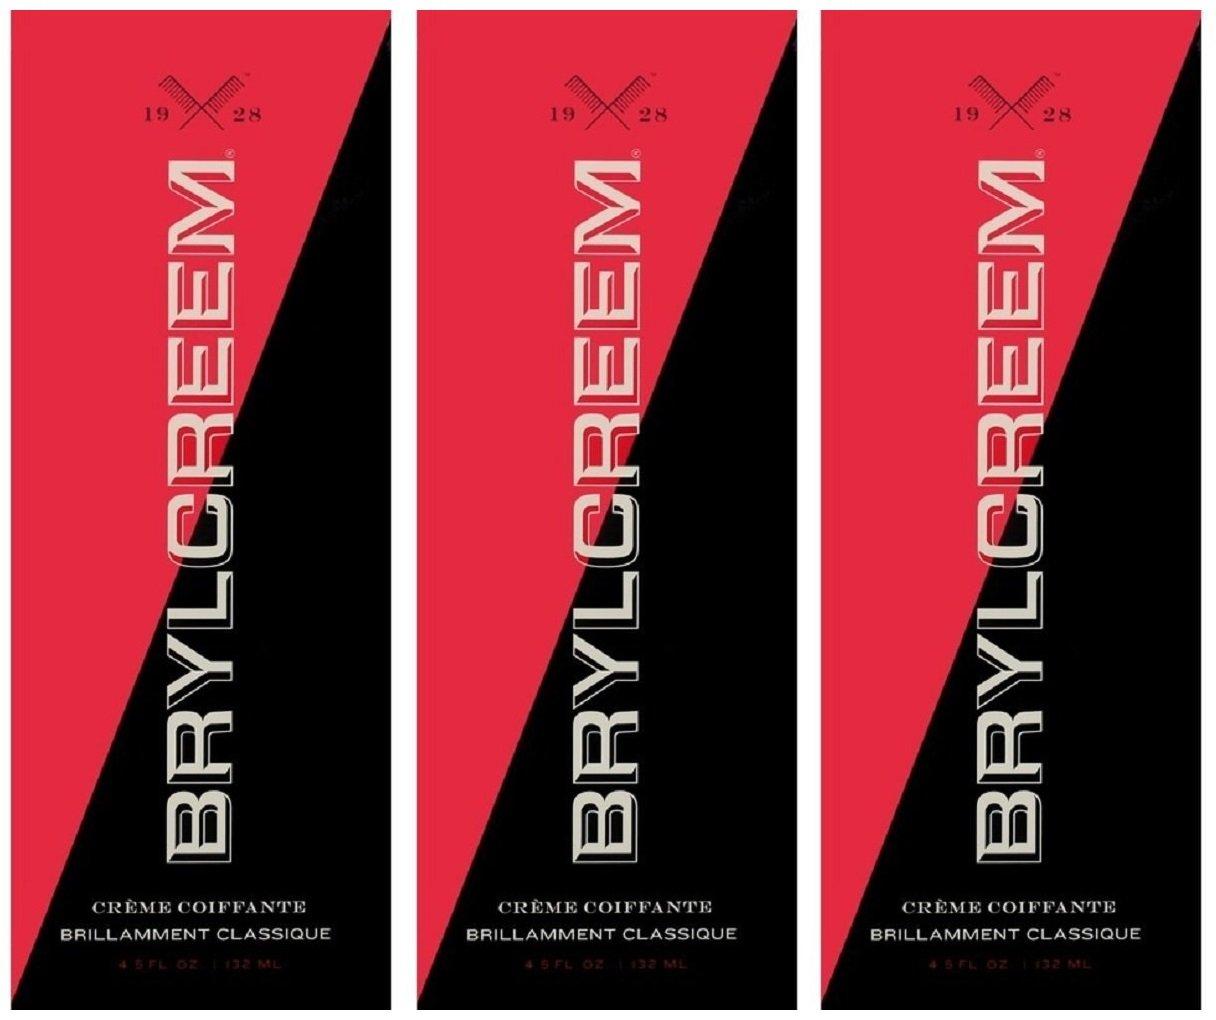 Brylcreem Hair Groom, Original, 4.5 Fl Oz / 132 Ml (Pack of 3) by Brylcreem